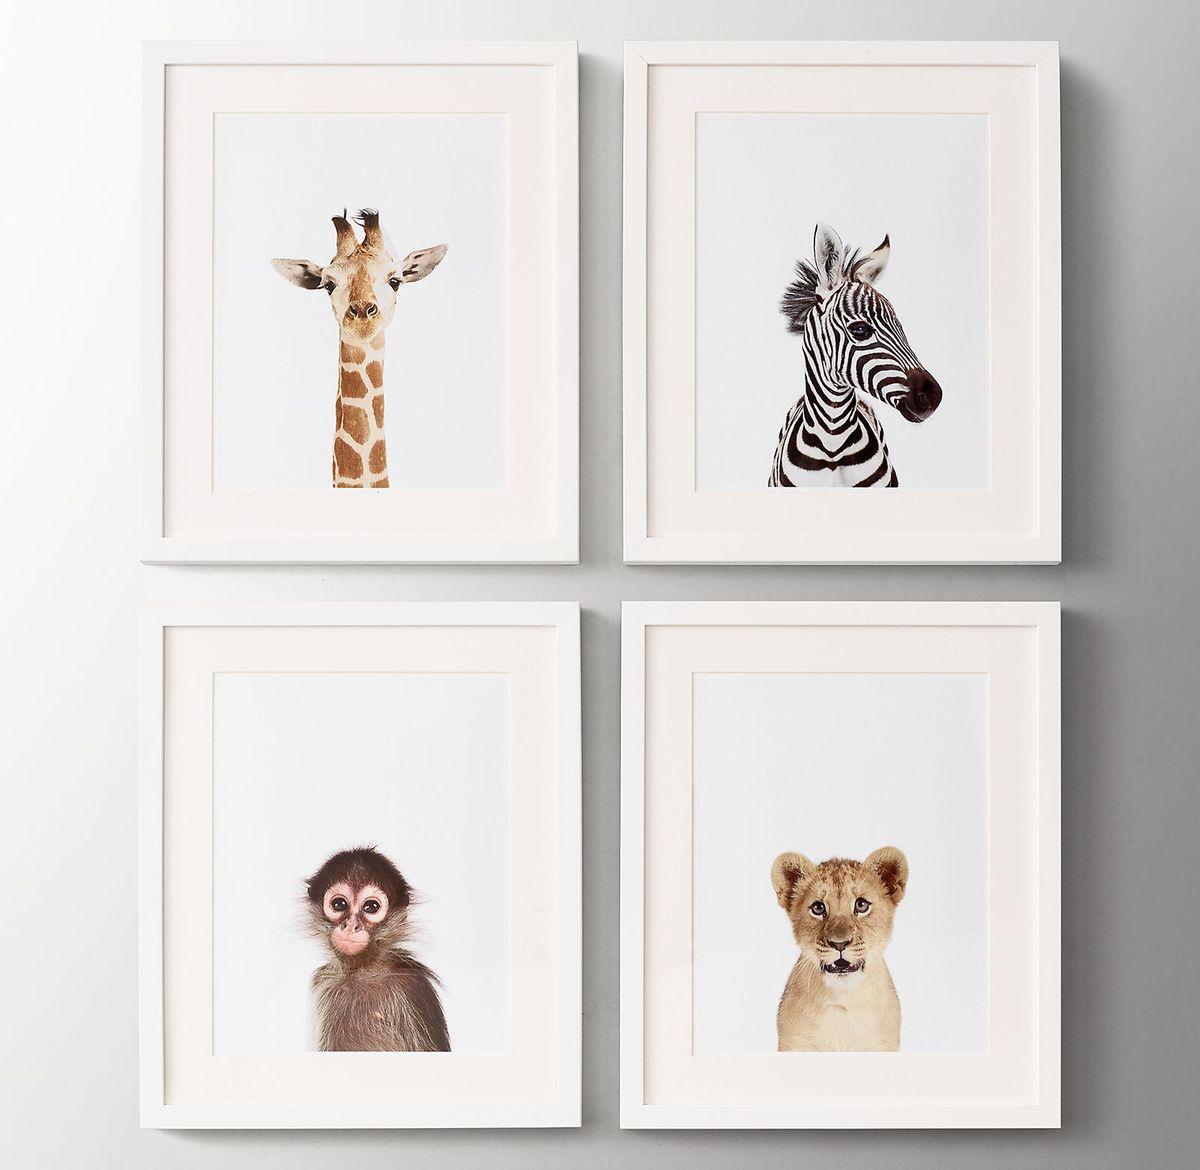 Baby Animal Close Up Portraits